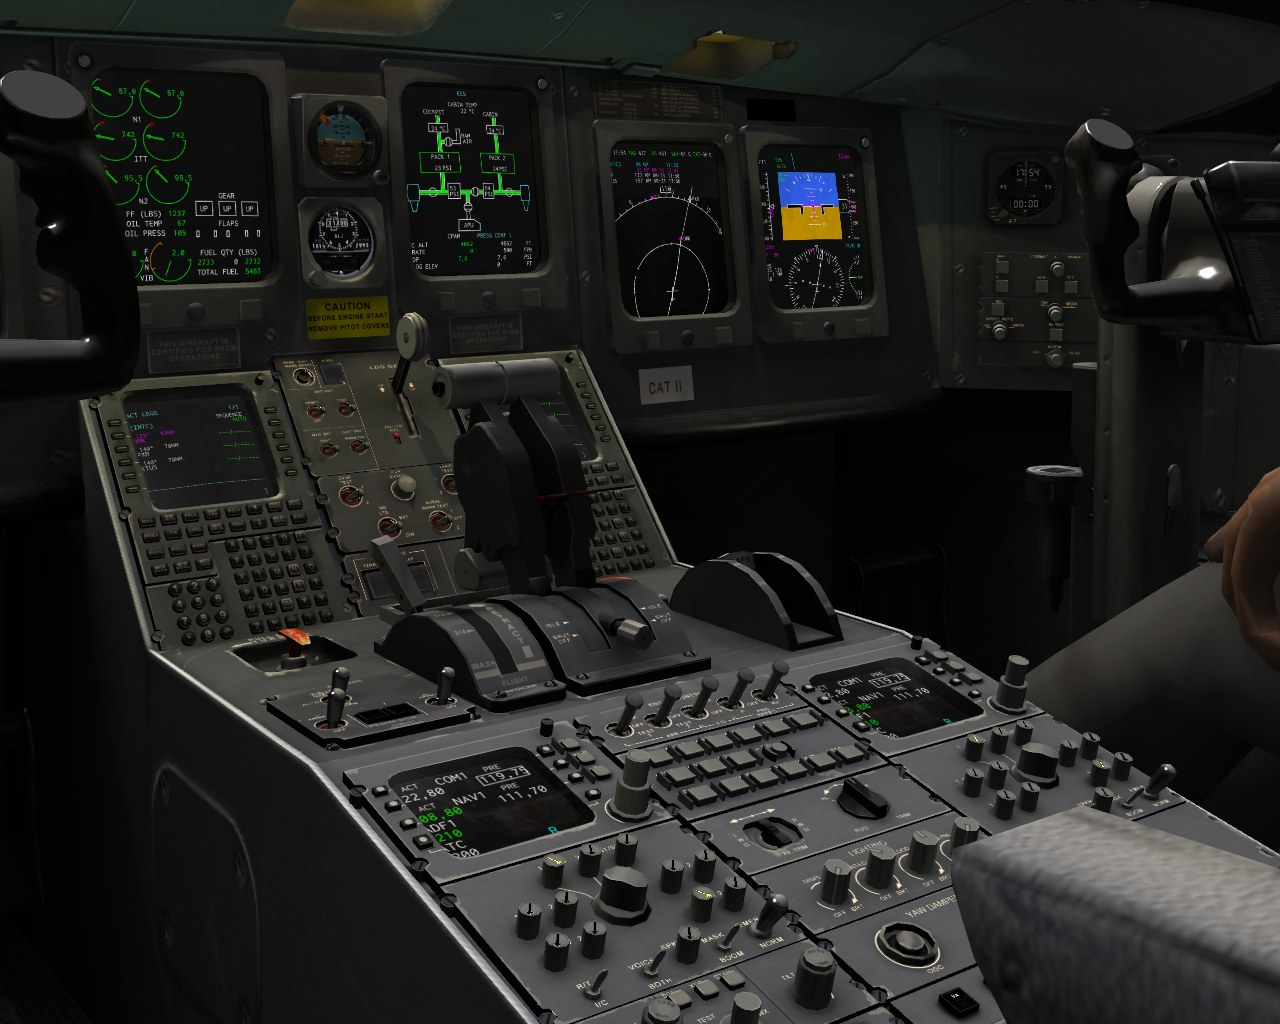 CRJ200 - The X-Plane General Discussions Forum - The AVSIM